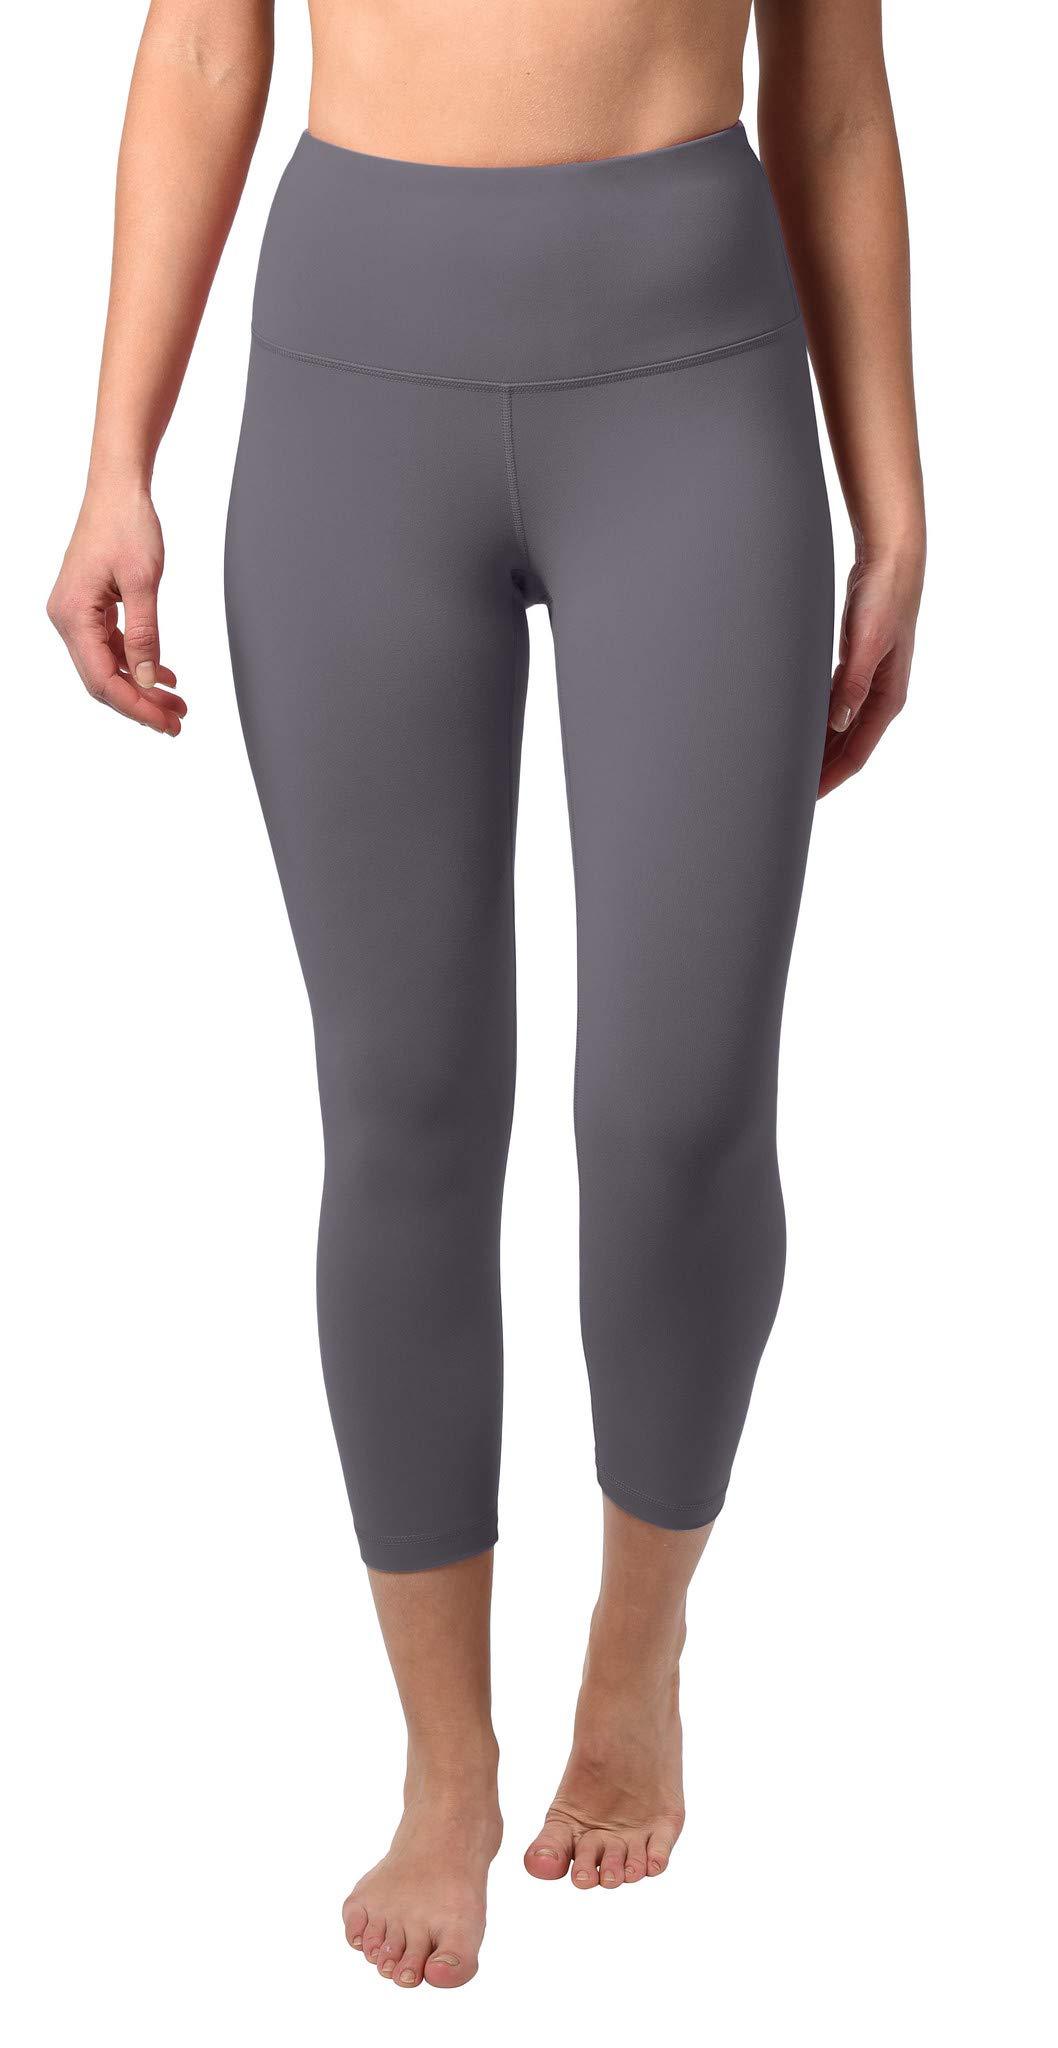 90 Degree By Reflex - High Waist Tummy Control Shapewear - Power Flex Capri - Purple Moon - XS by 90 Degree By Reflex